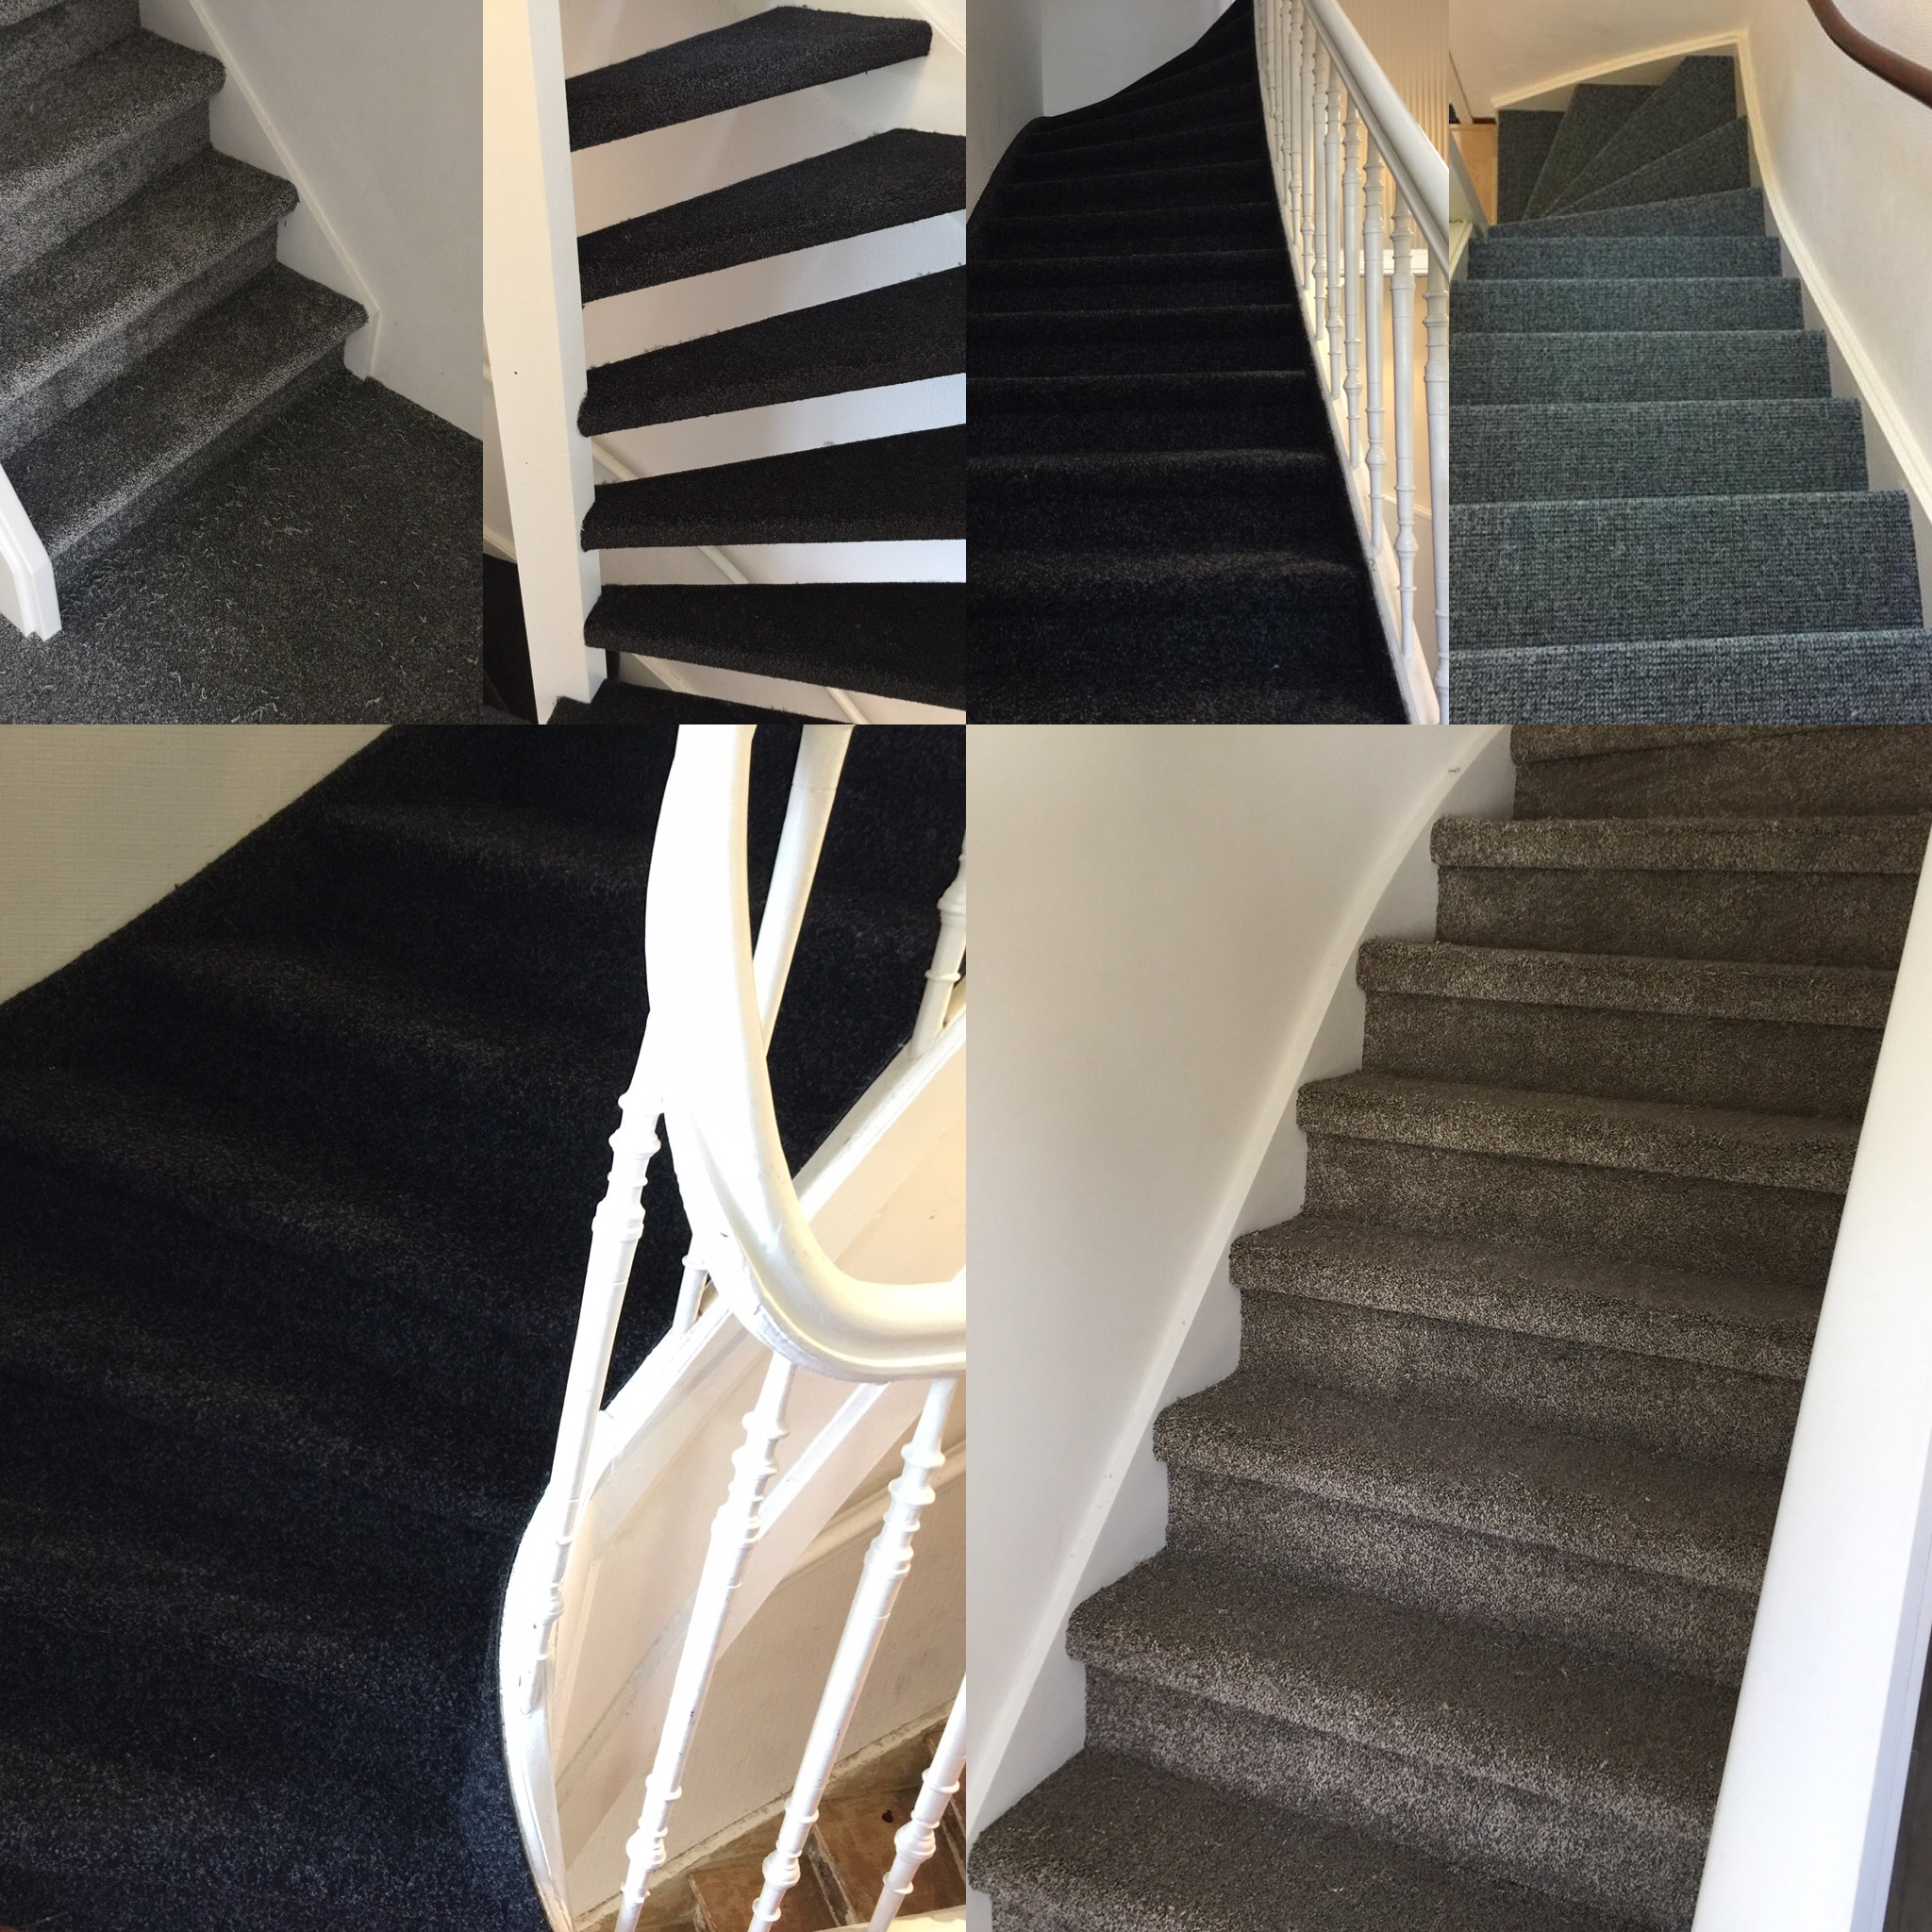 Uitgelezene Trappen bekleden Utrecht – Vakkundig en voordelig trappen stofferen XG-01